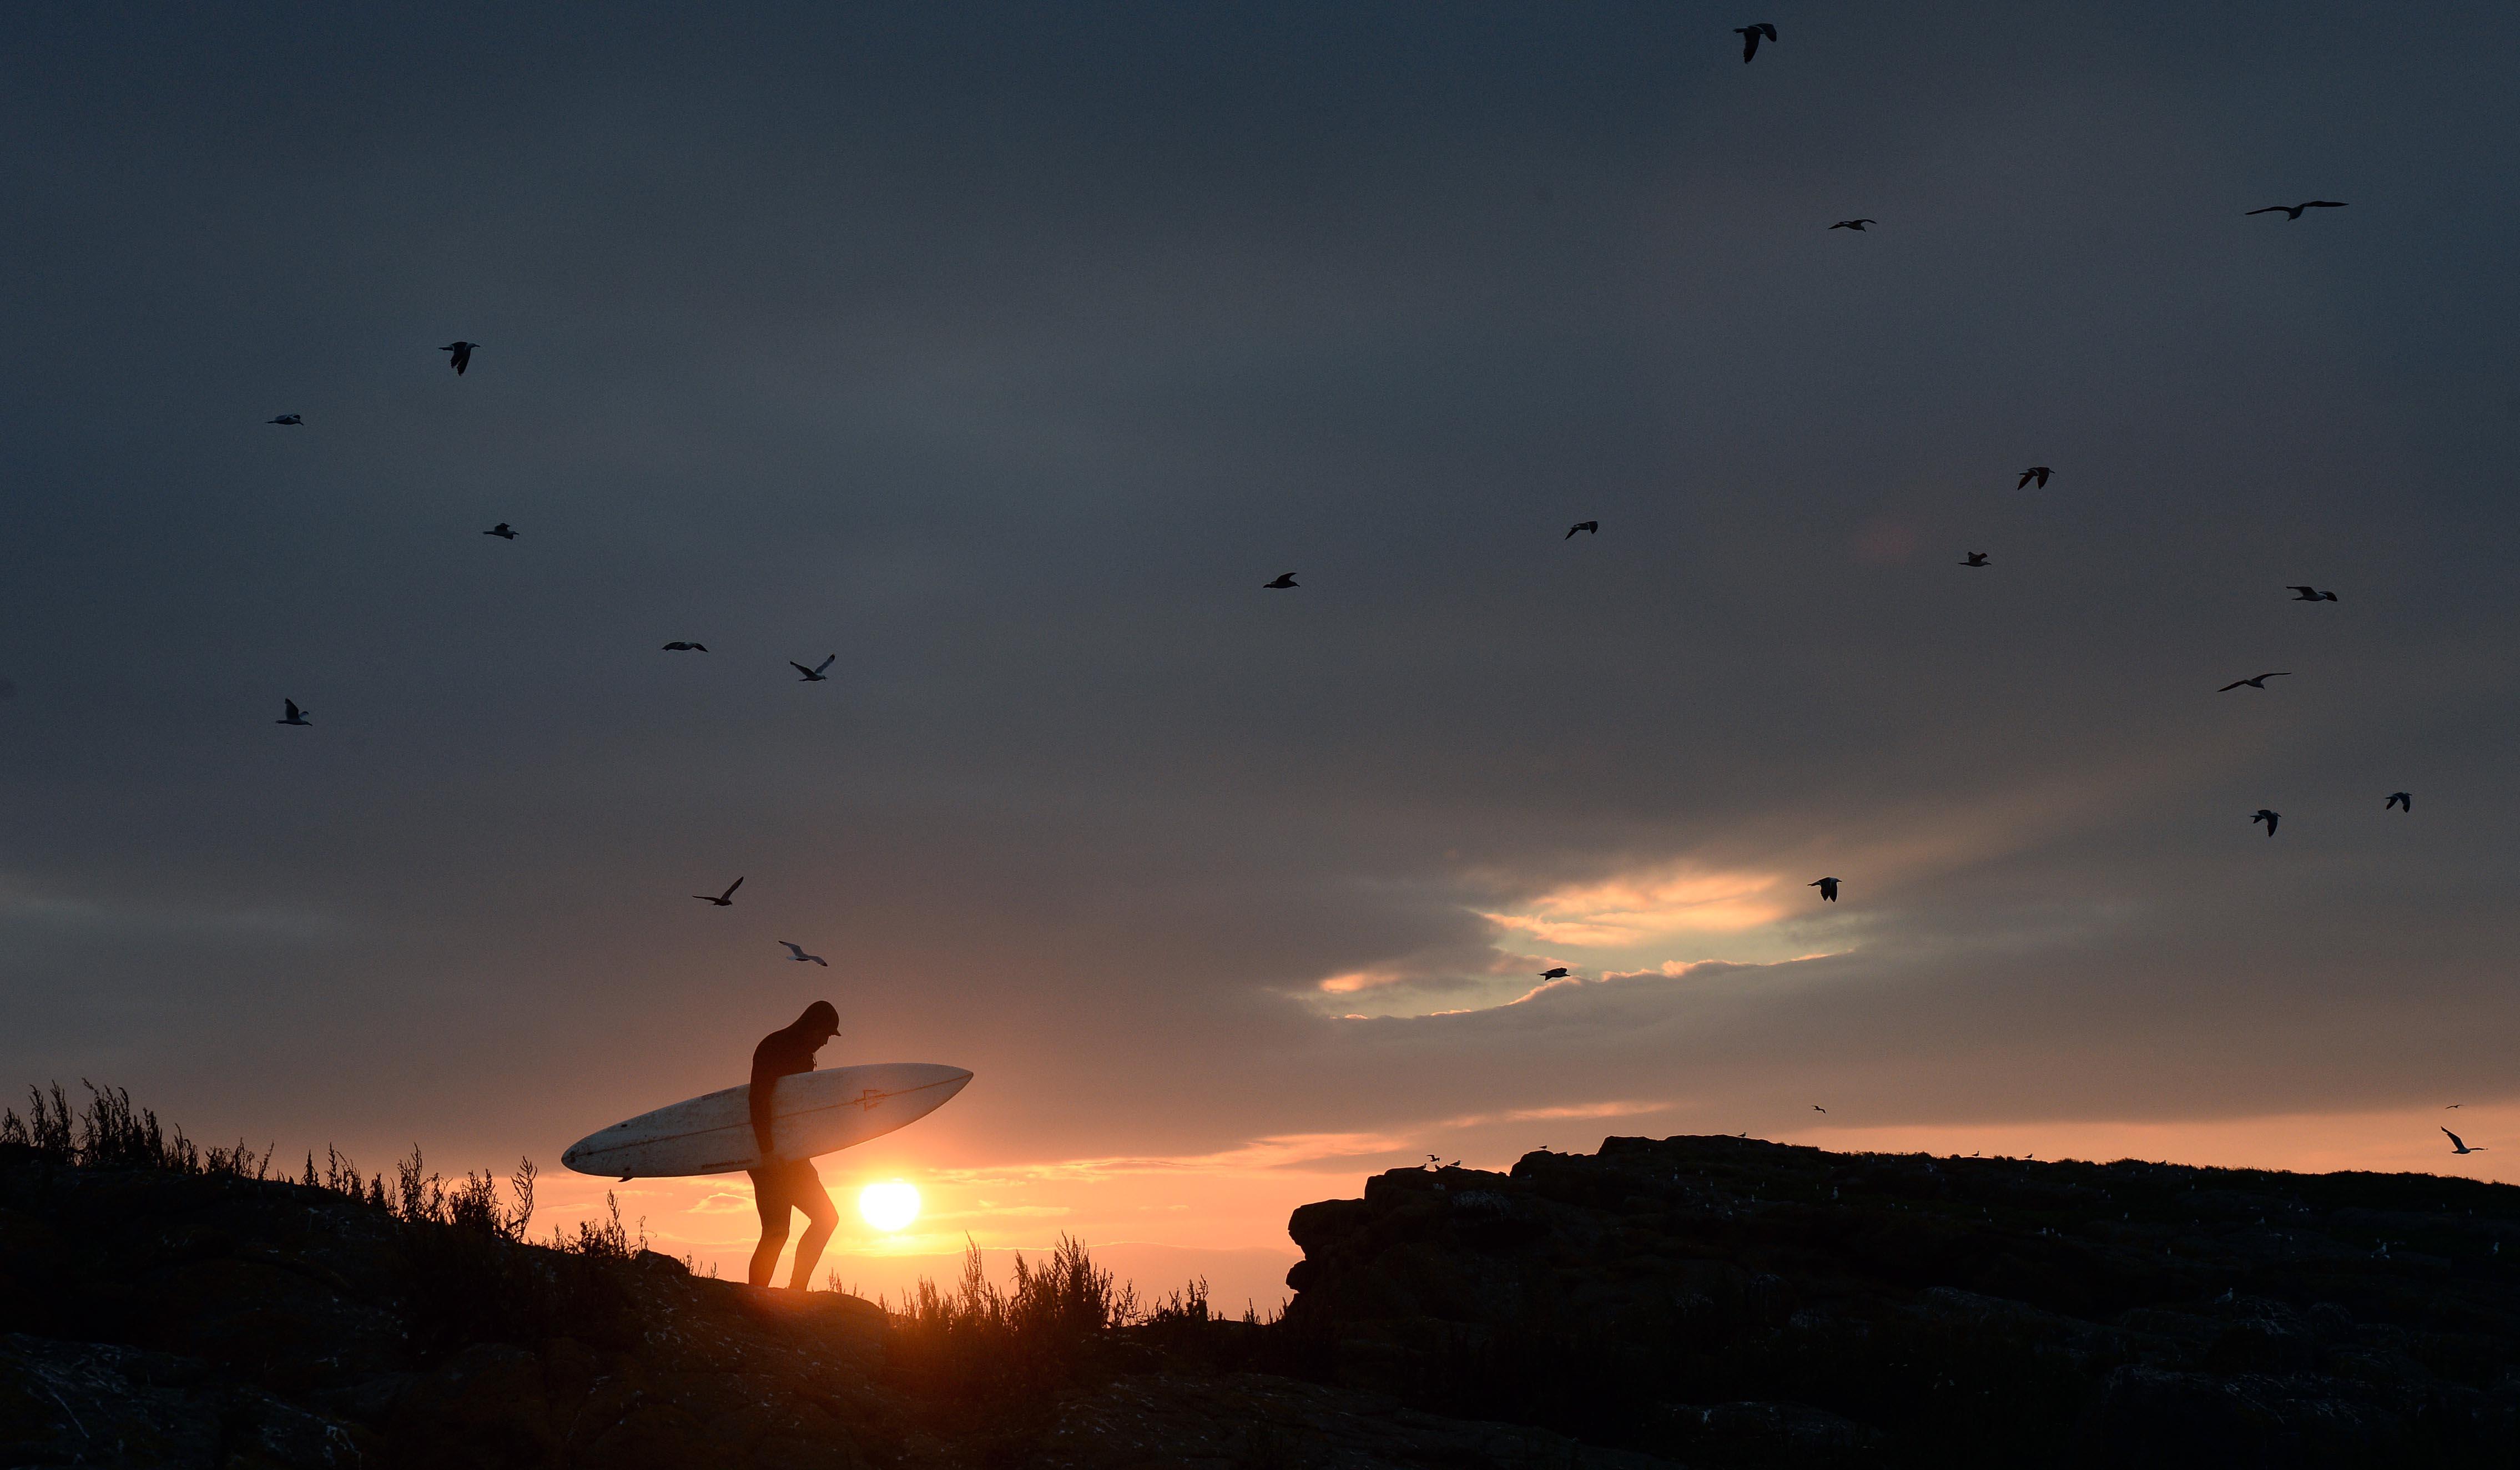 Al Mennie dawn north coast picture by charles mcquillan